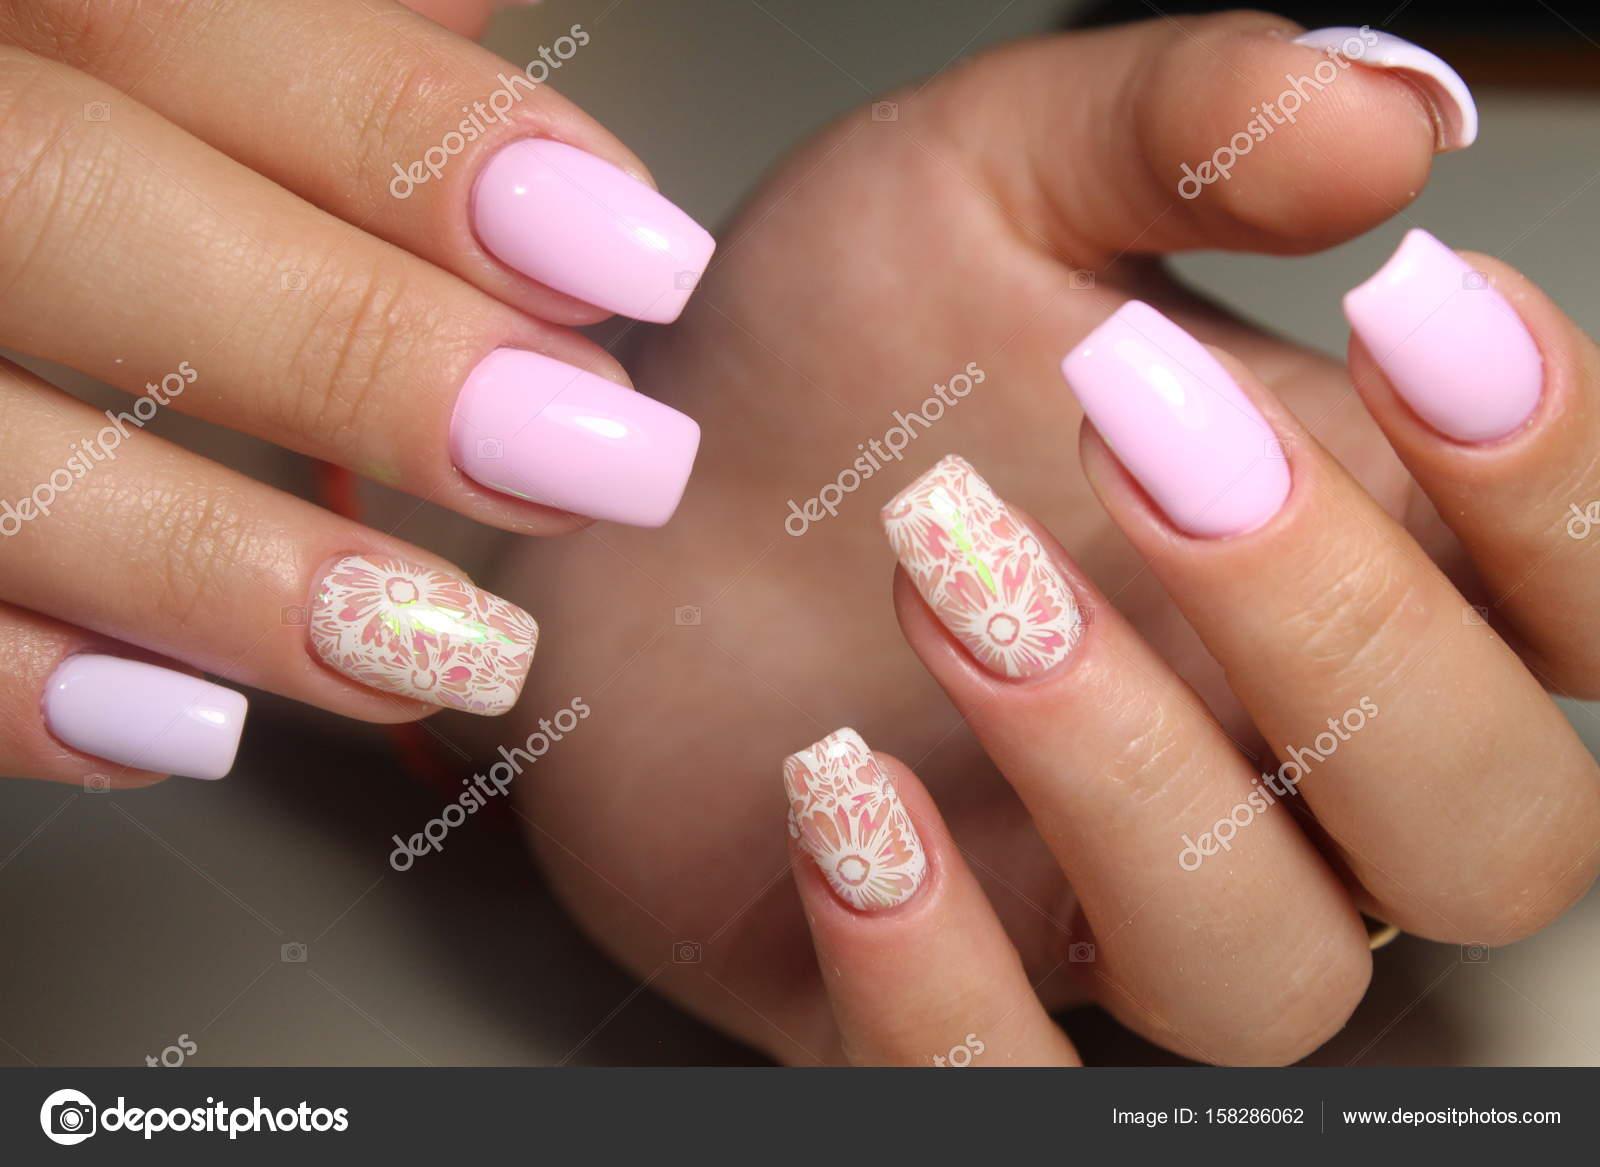 Manicure diseo uas gel Foto de stock SmirMaxStock 158286062